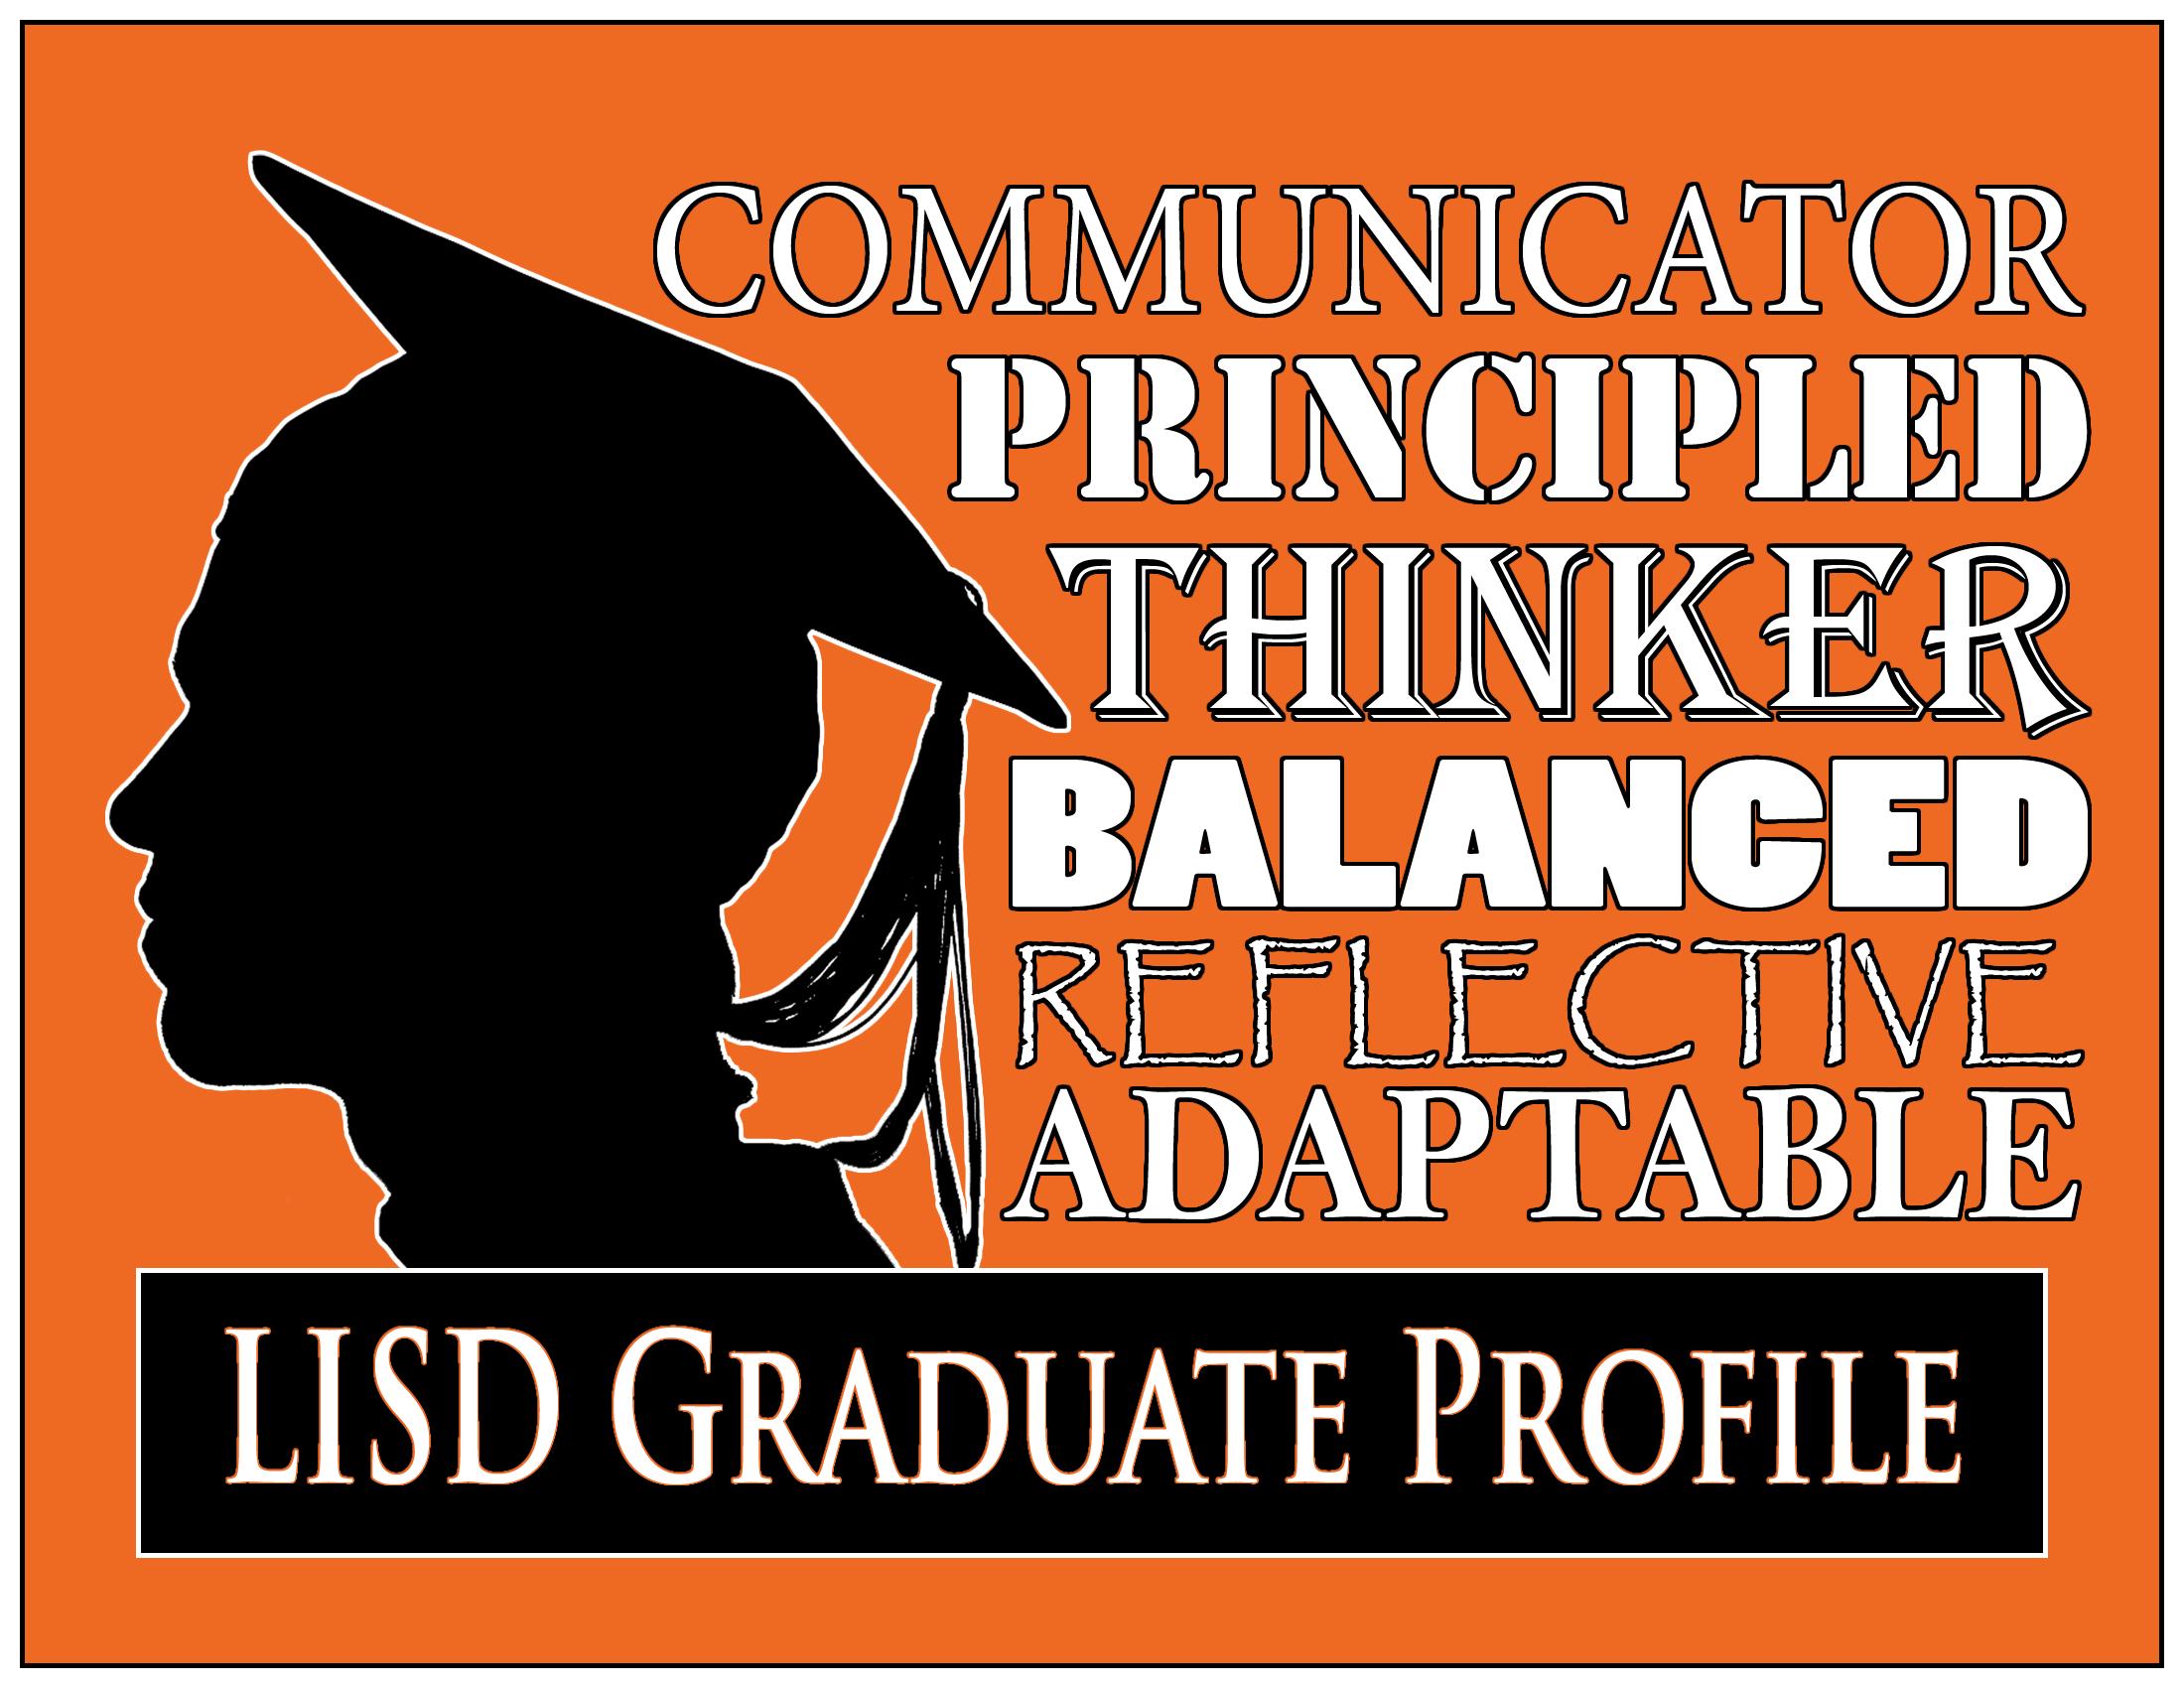 LISD Graduate Profile image